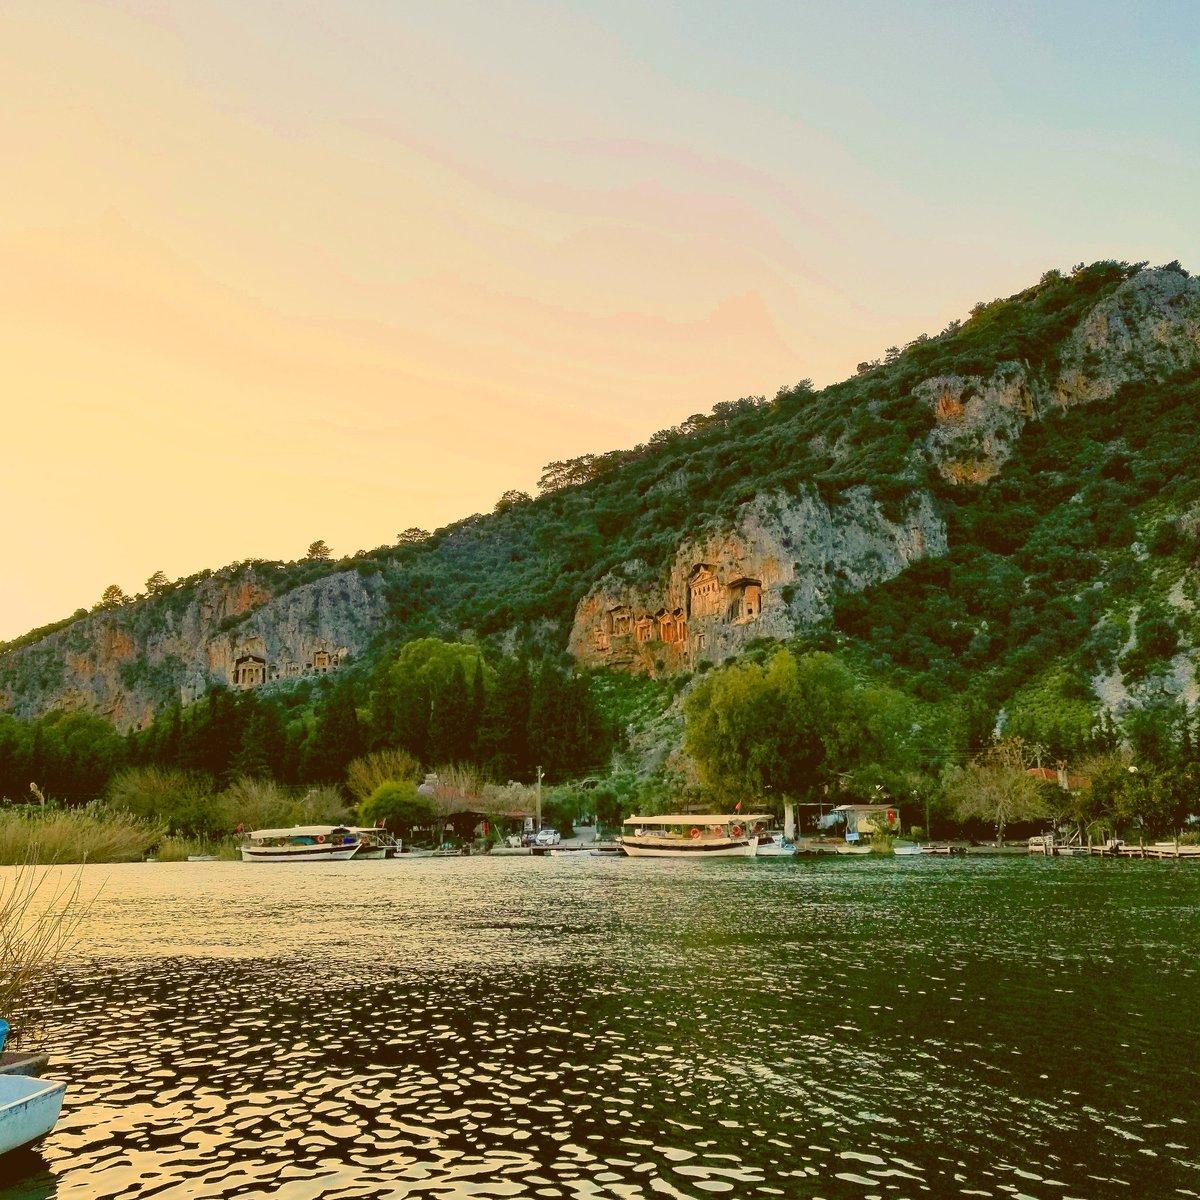 Sunset time By Dalyan river   #travel #dalyan  #river #turkey #goodevening  #ortaca #peaceful  #traveler #トルコ #旅行 #sunset #写真 #一人旅 #旅行 #写真 #tatlı  #mutlu  #lycian #picoftheday  #landscapephotography #solotraveler  #photo #beautifulpic.twitter.com/1woFpd03py